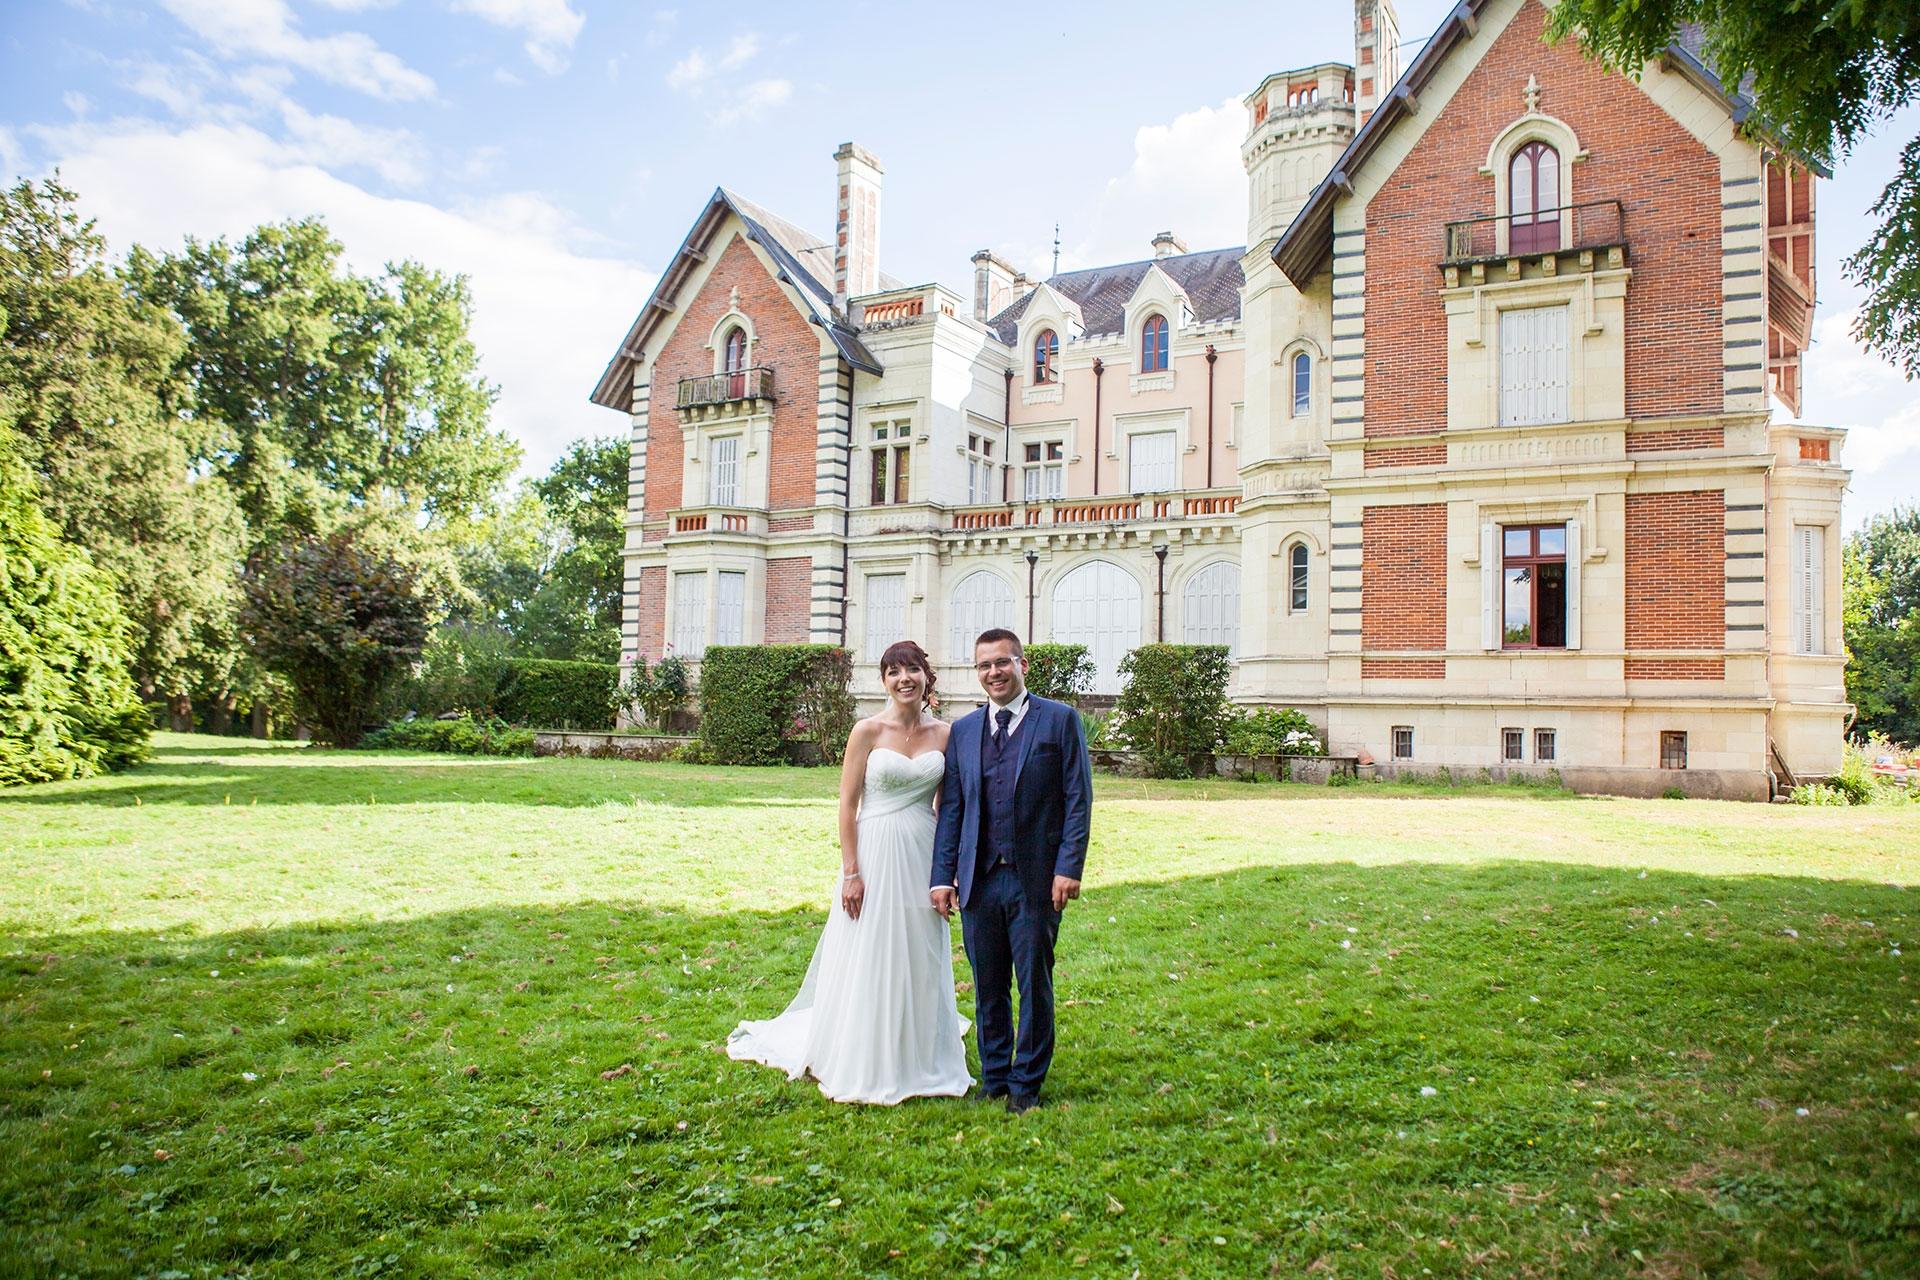 particuliers-evenements-mariages-oui-aurelie&geoffrey-29